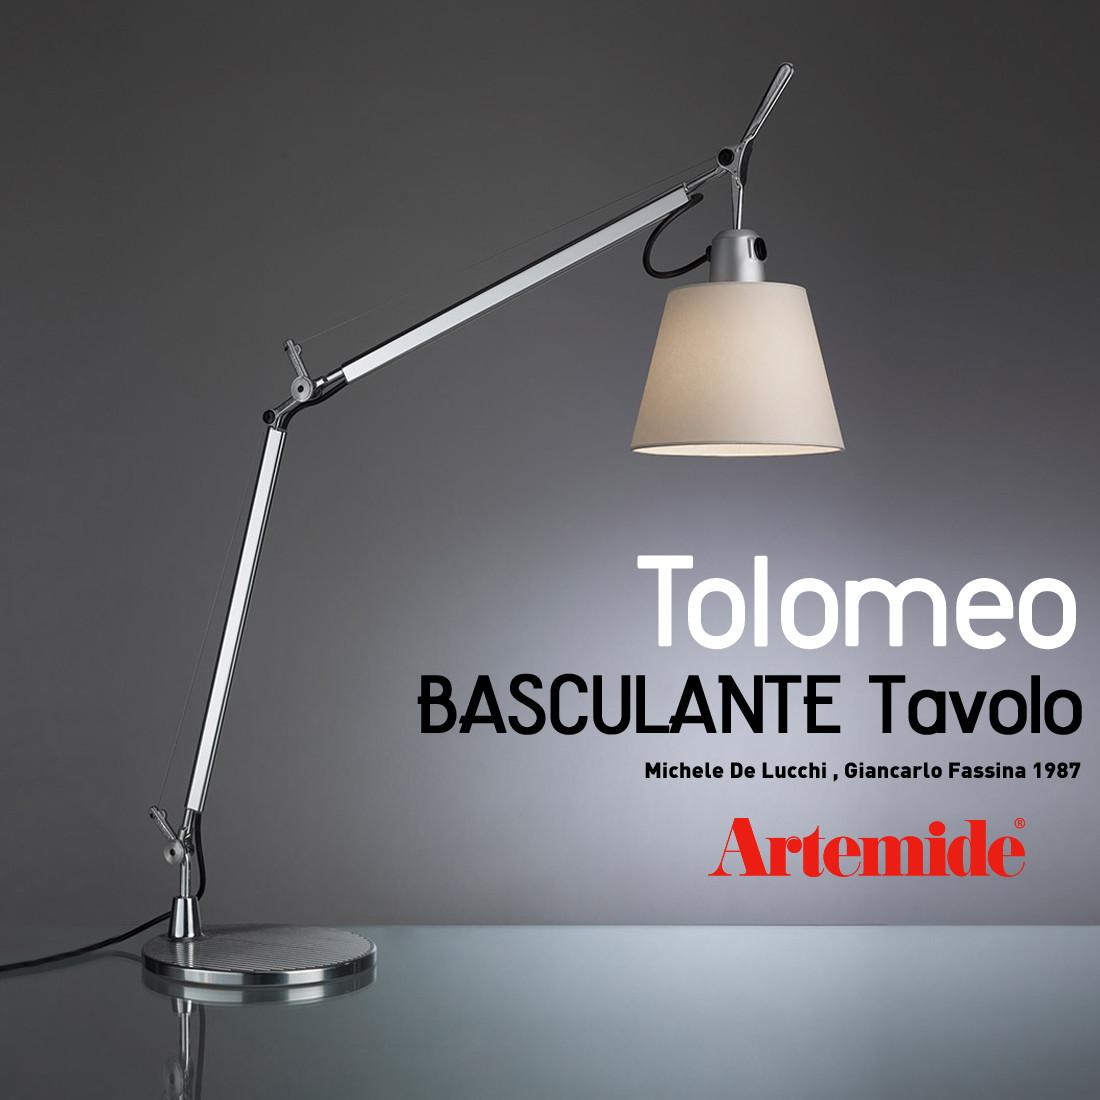 【Artemide アルテミデ】TOLOMEO BASCULANTE TABLEO トロメオ テーブルランプ 電球仕様ライト 照明 リビング キッチン スタンド 寝室 テーブルライト